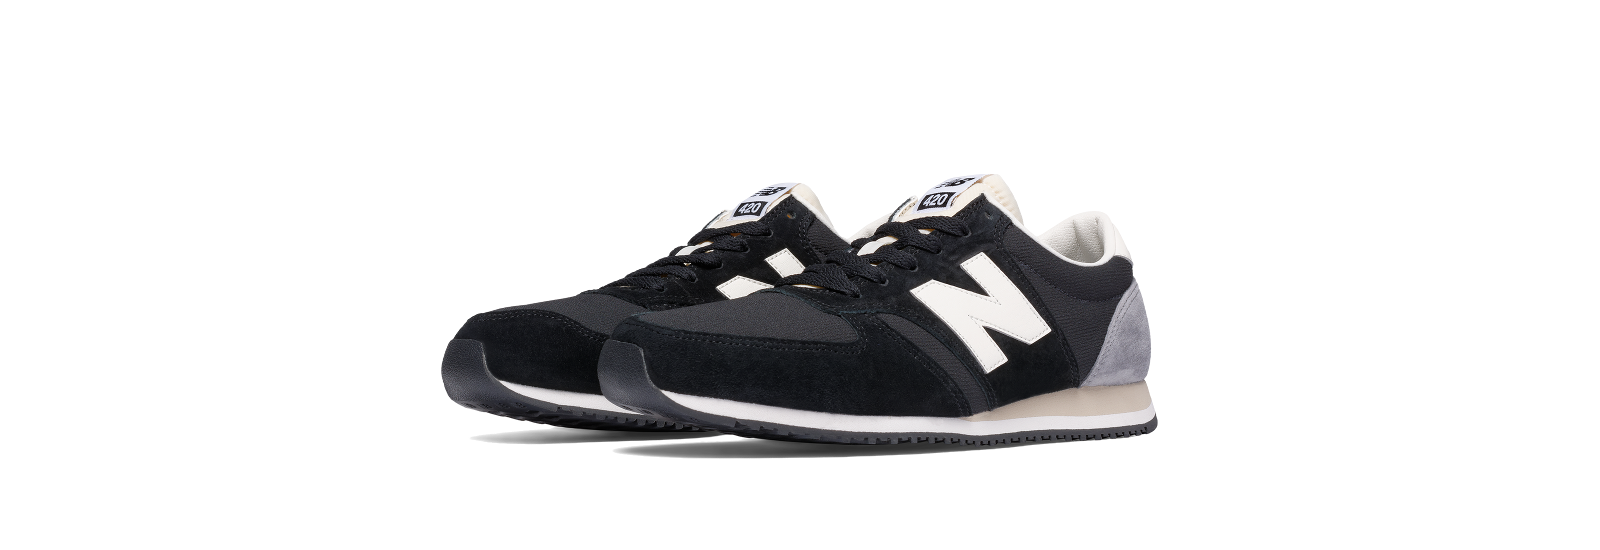 Buty New Balance U420rkg New Balance Golden Goose Sneaker Sneakers